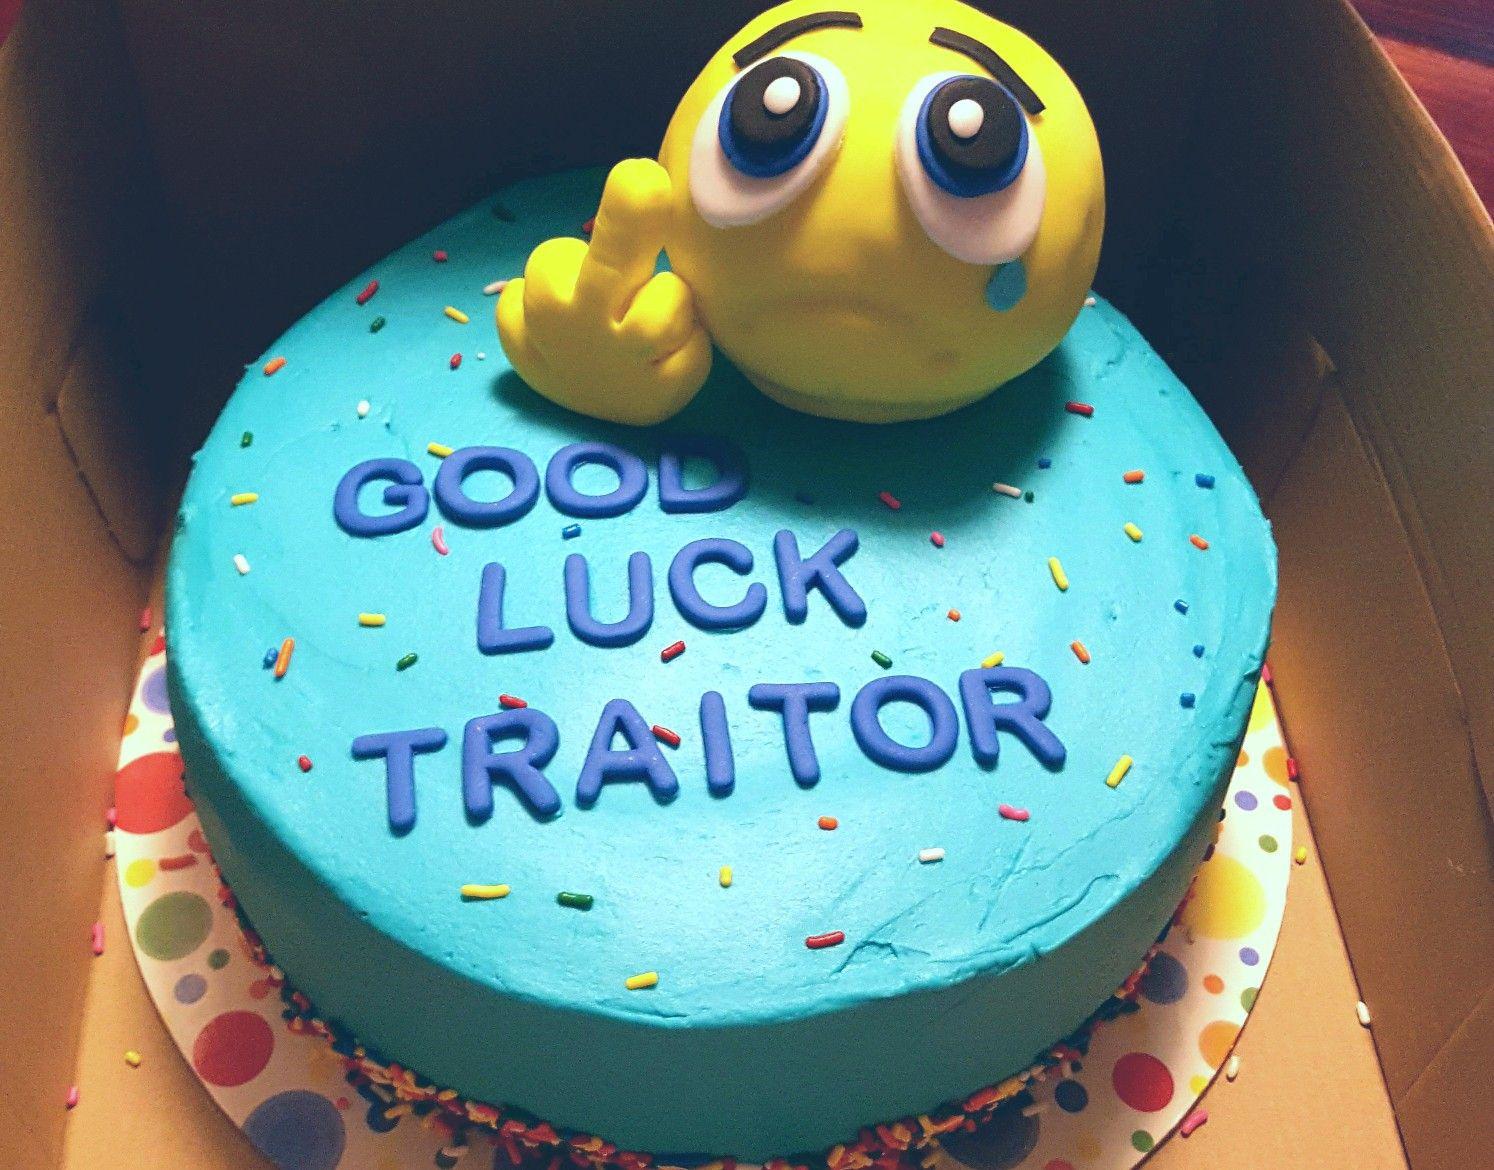 Good Luck traitor, emoji cake, Fondant decoration Cake